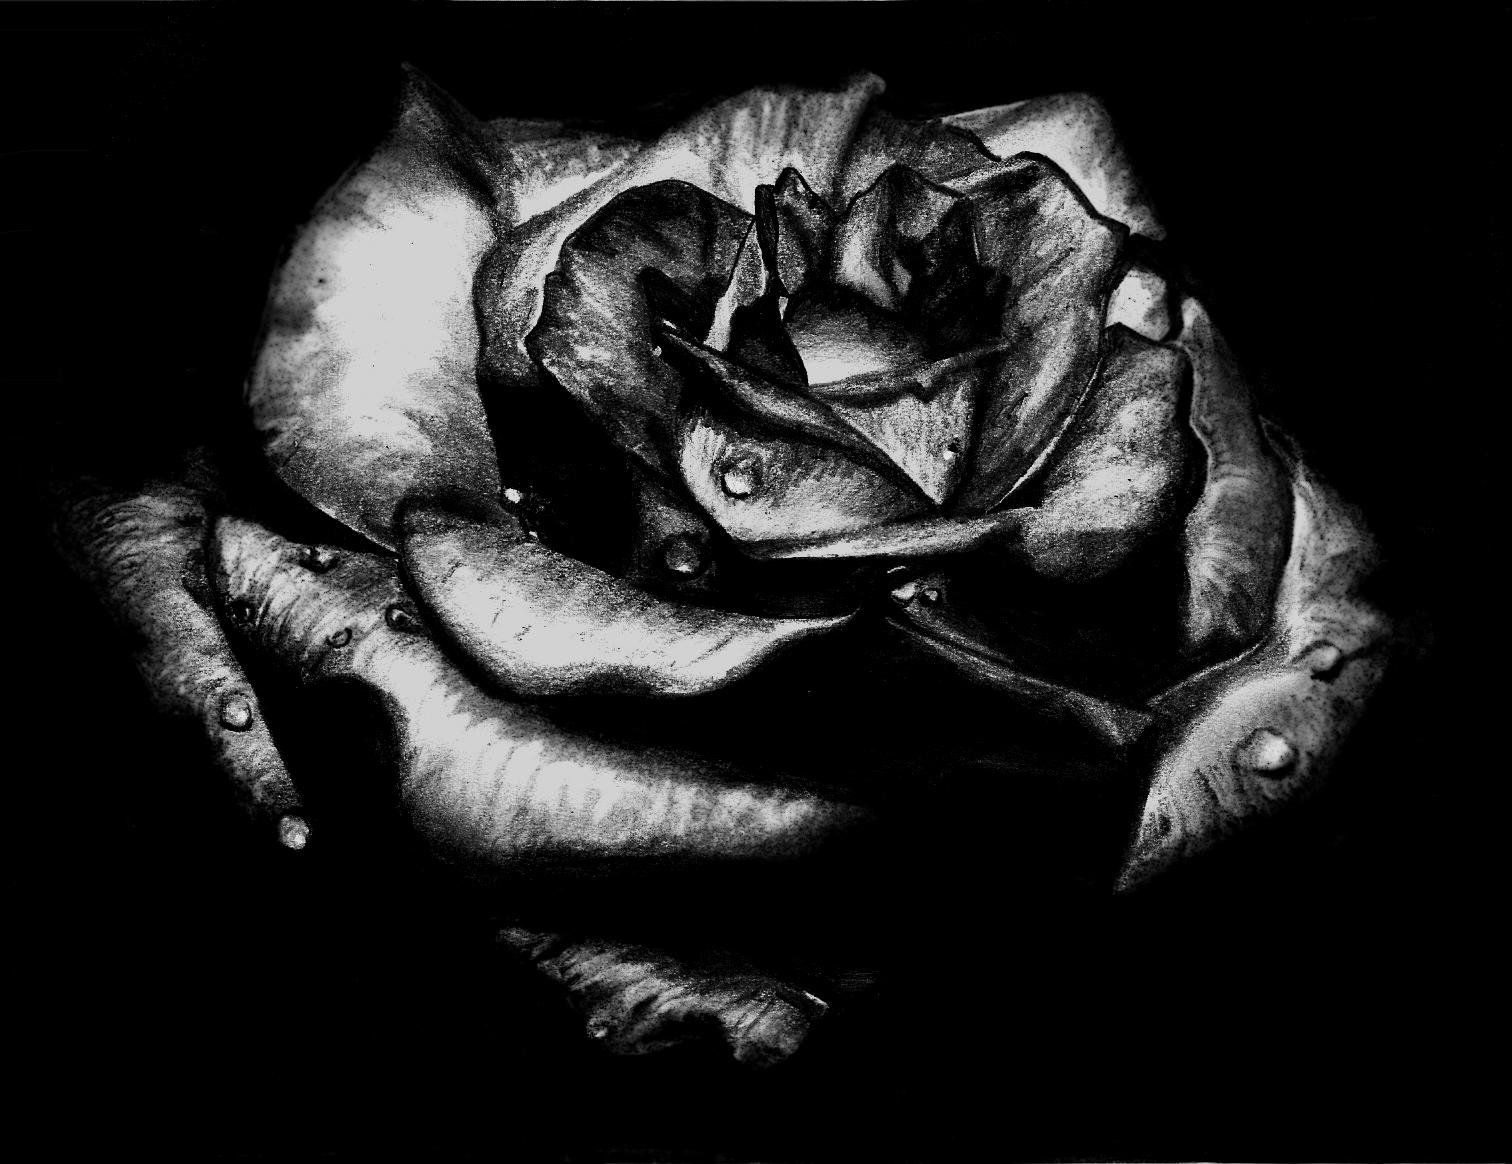 Hoa hồng đen rất đẹp